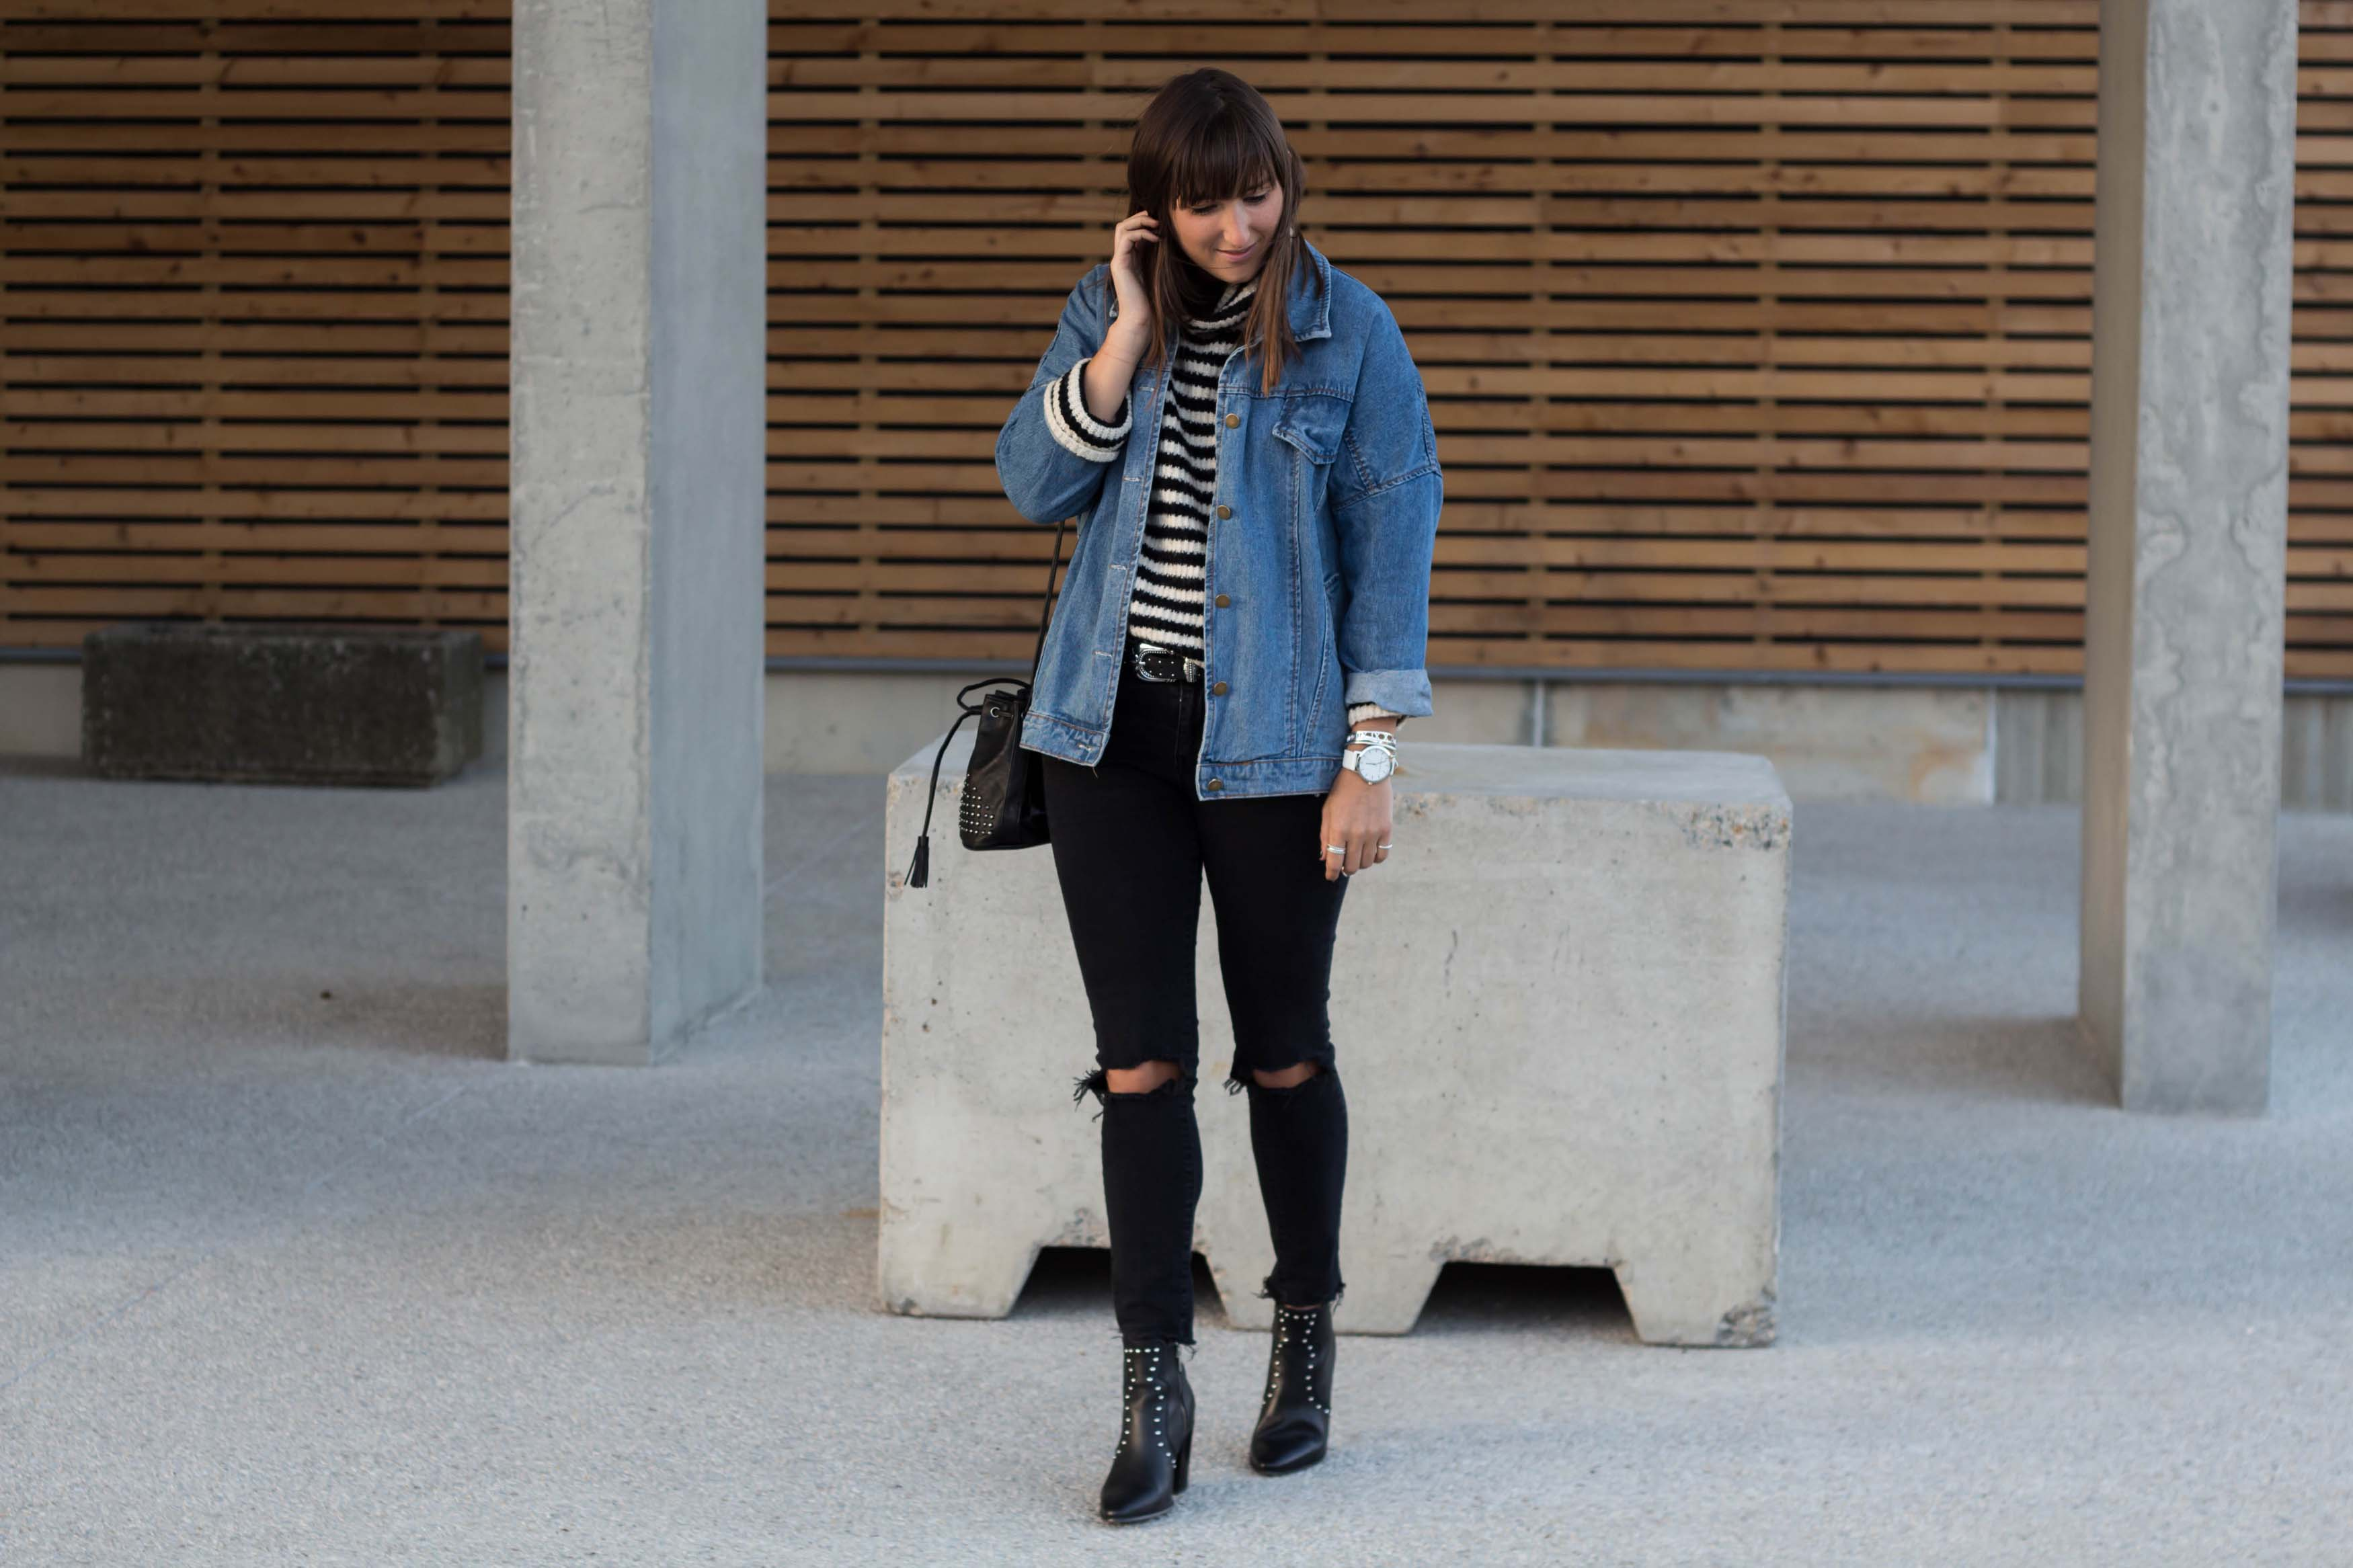 blog-mode-jean-shein-linstantflo-13-sur-18